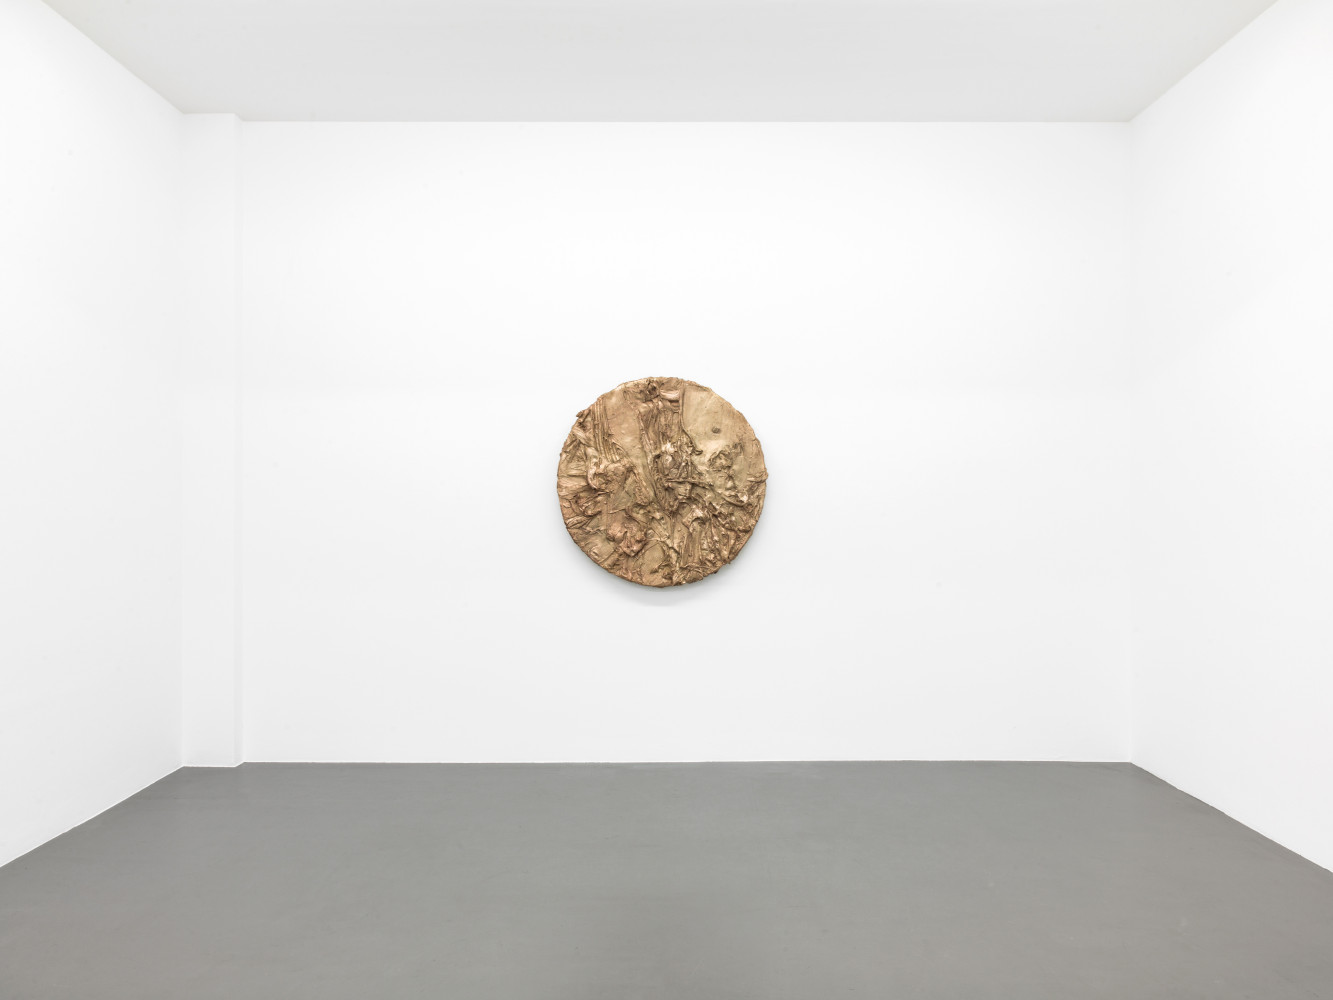 Jason Martin, 'Tondo', Installation view, Buchmann Galerie, 2018